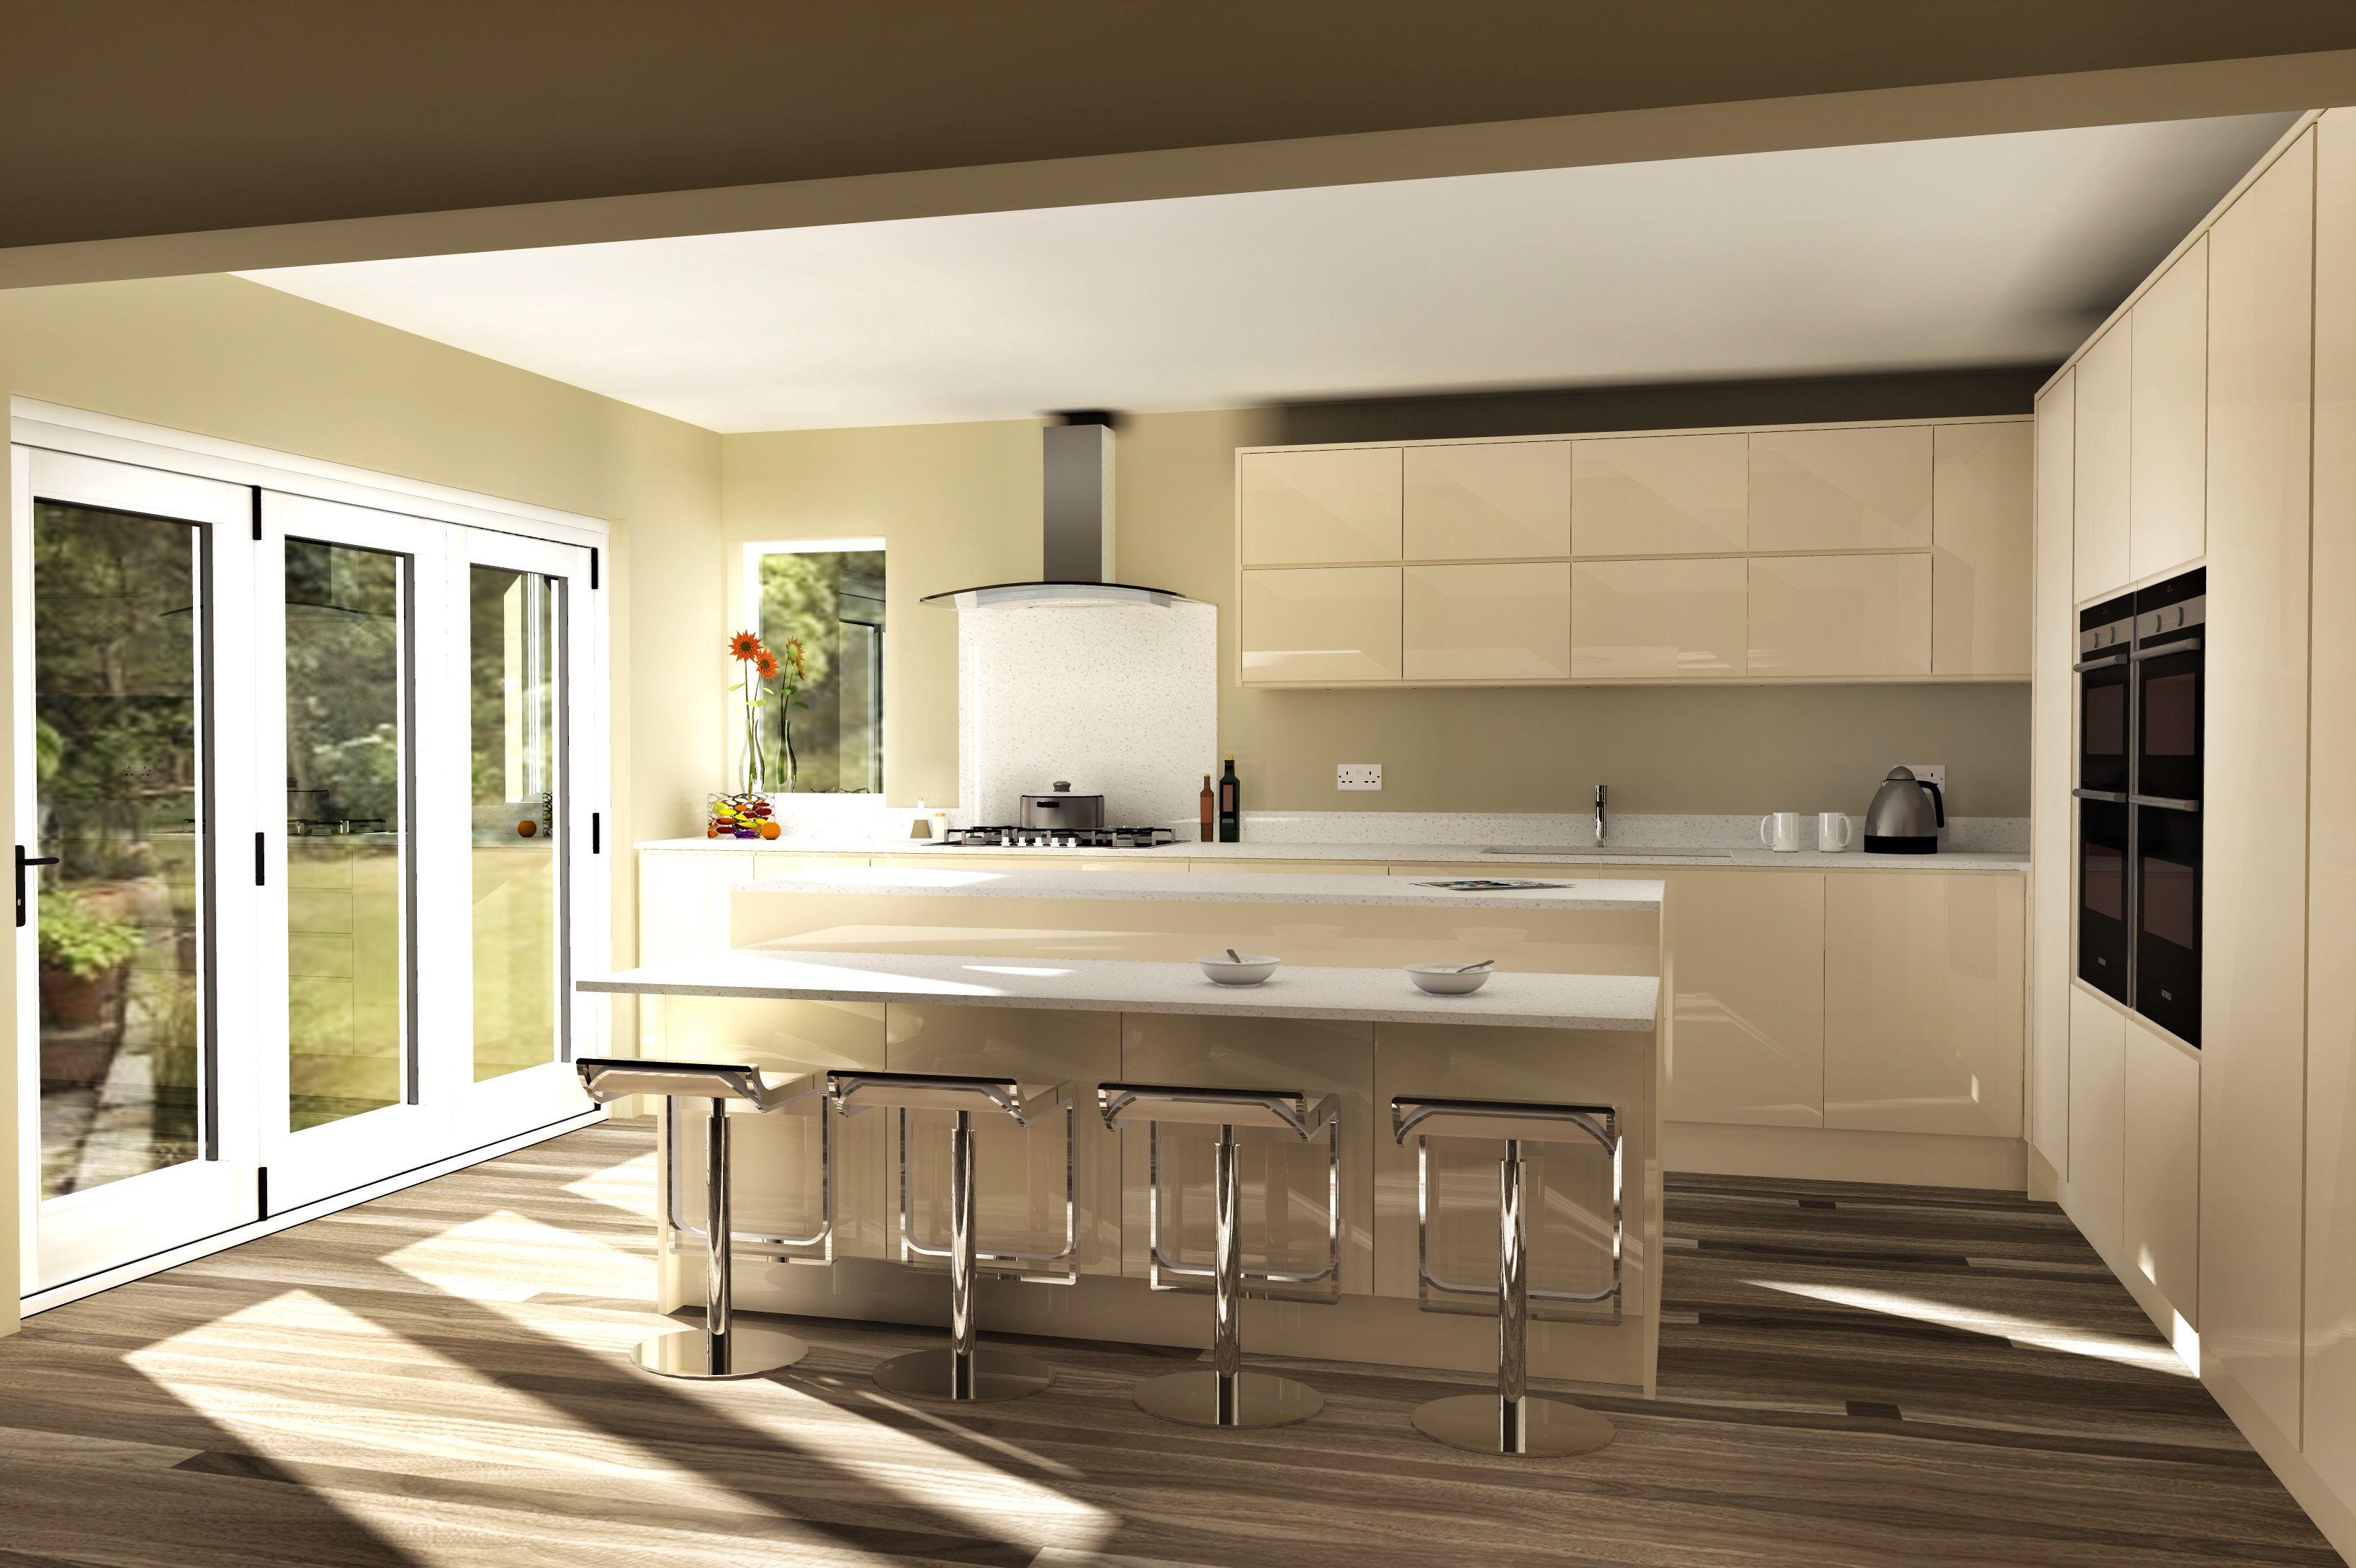 Modern Handleless Kitchen Remo Alabaster With Quartz CAD Model   SketchUp,  Artlantis, Snapseed By